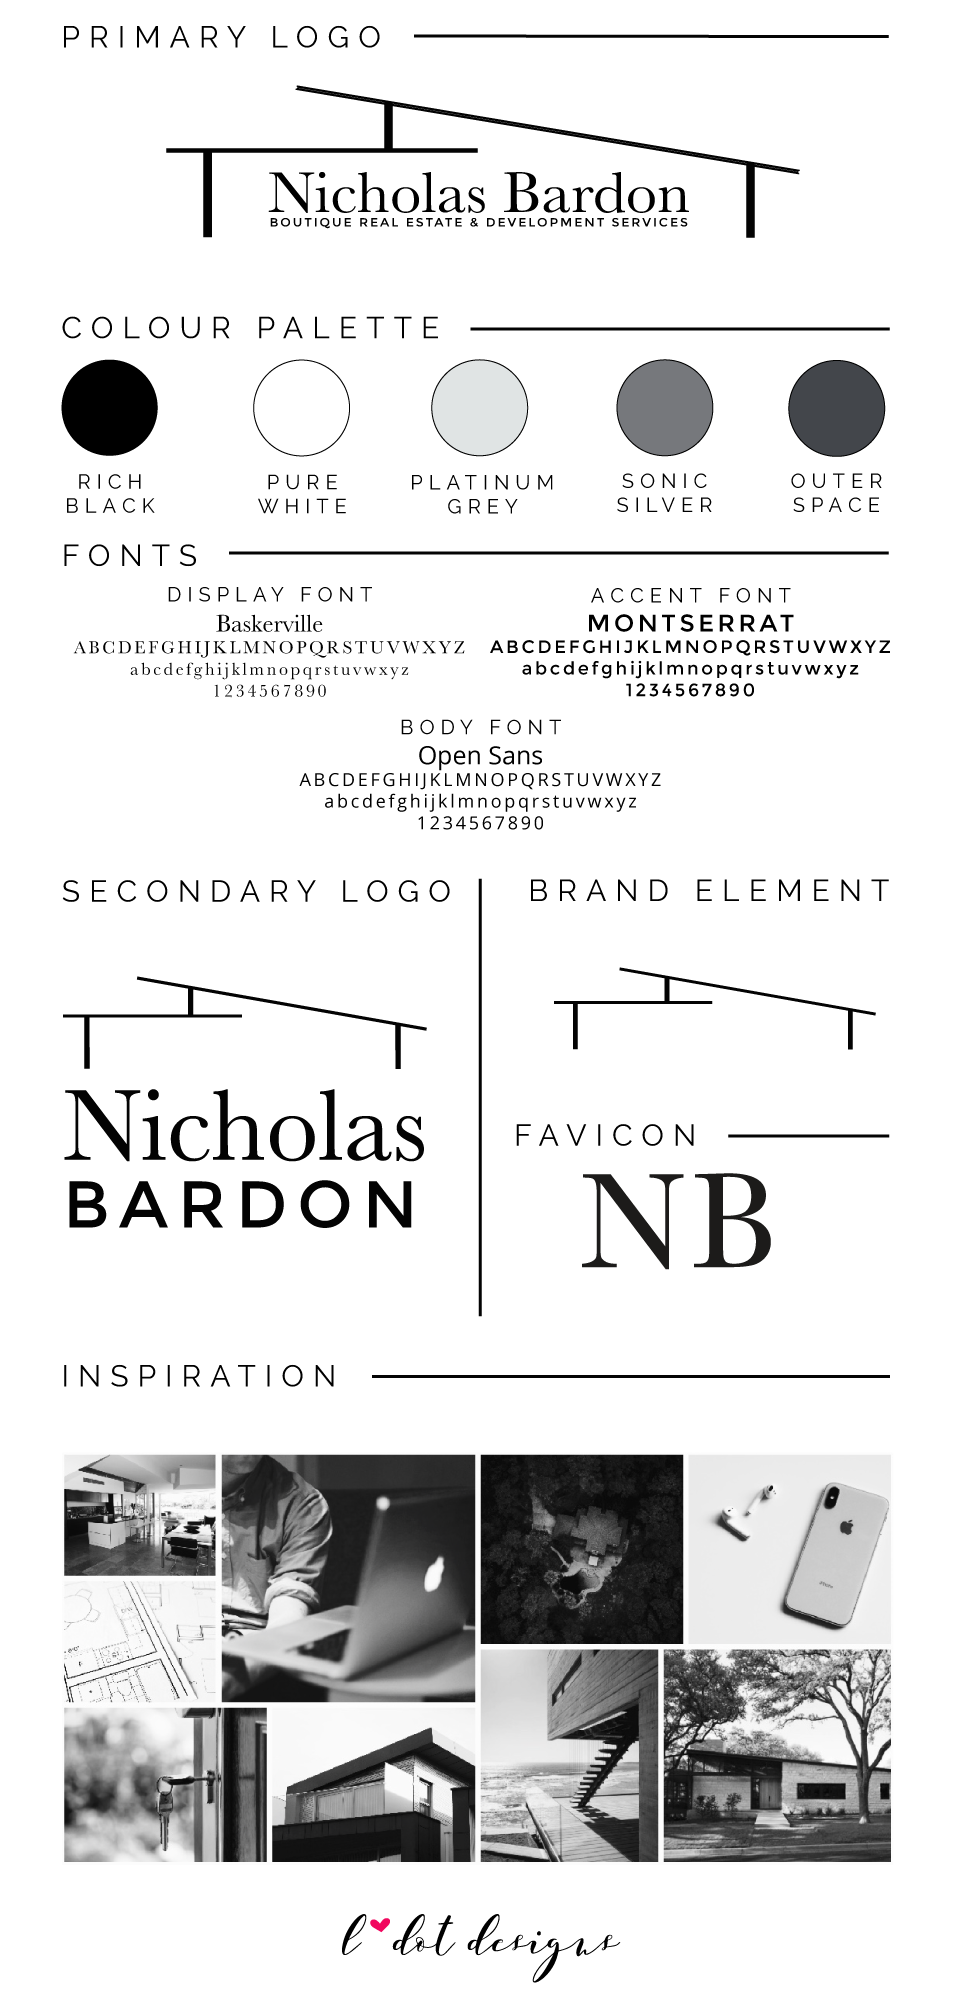 Nicholas-Bardon-Brand-Board.png